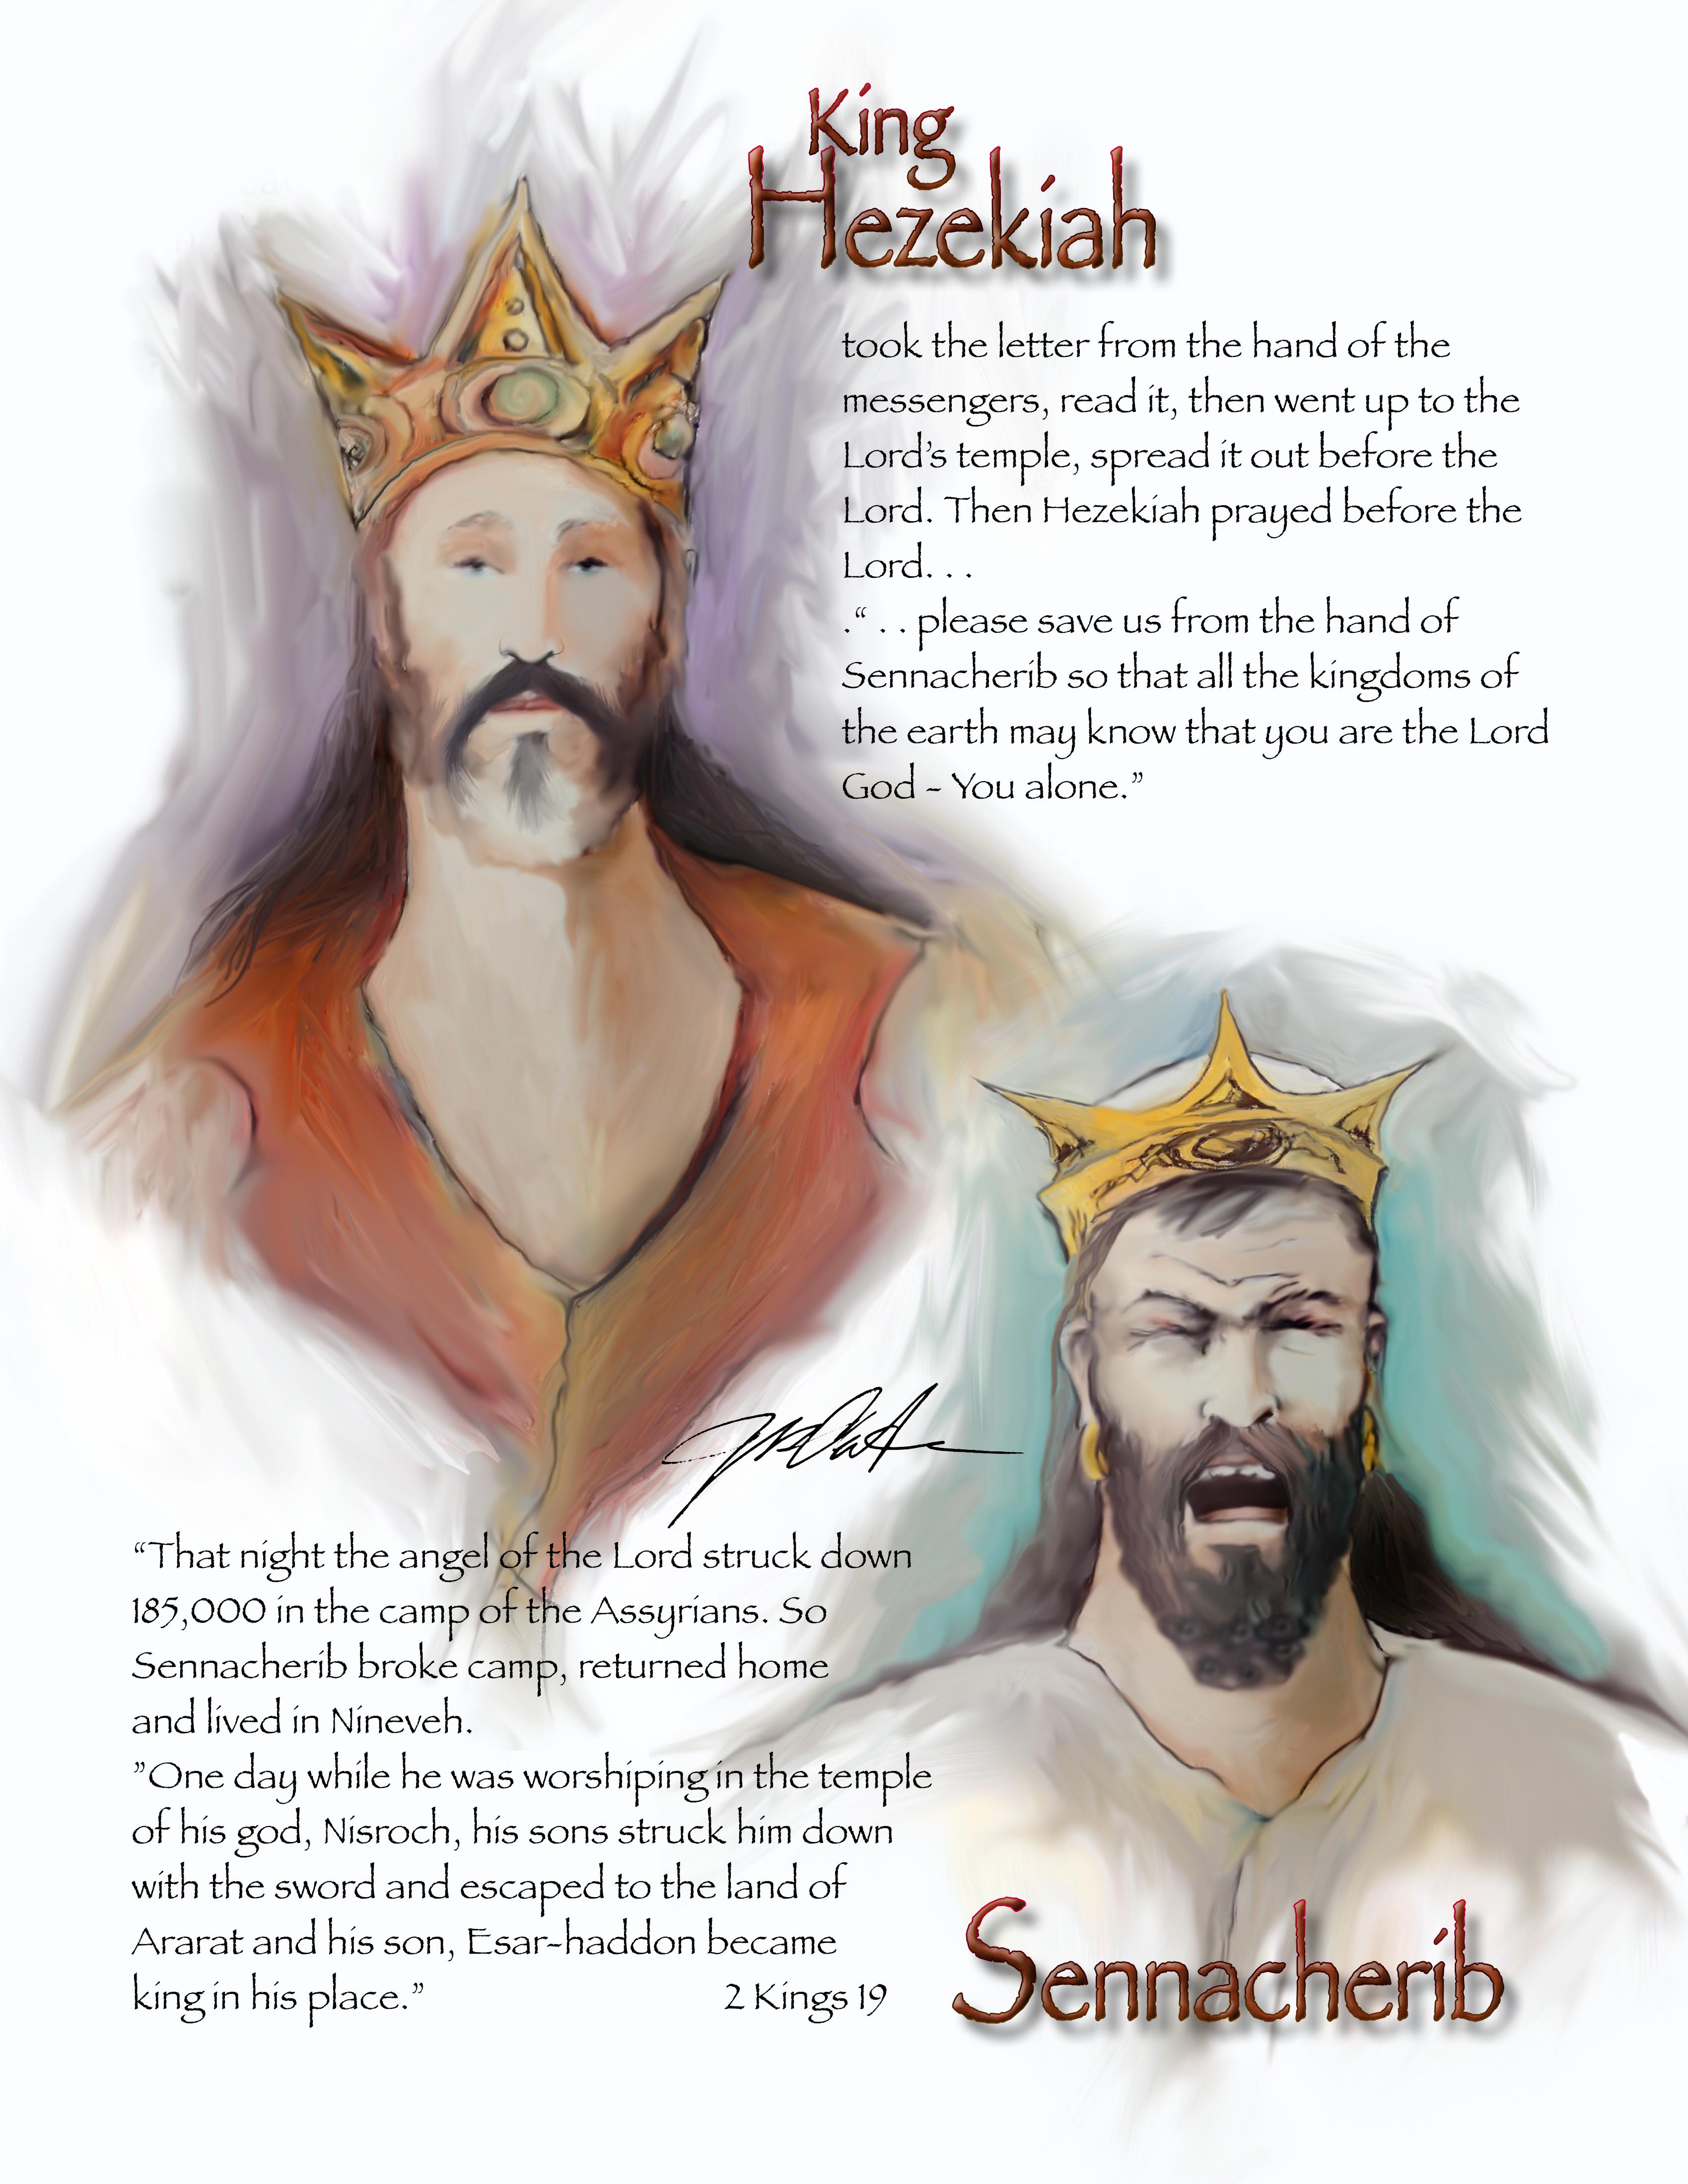 King Sennacherib Backgrounds on Wallpapers Vista